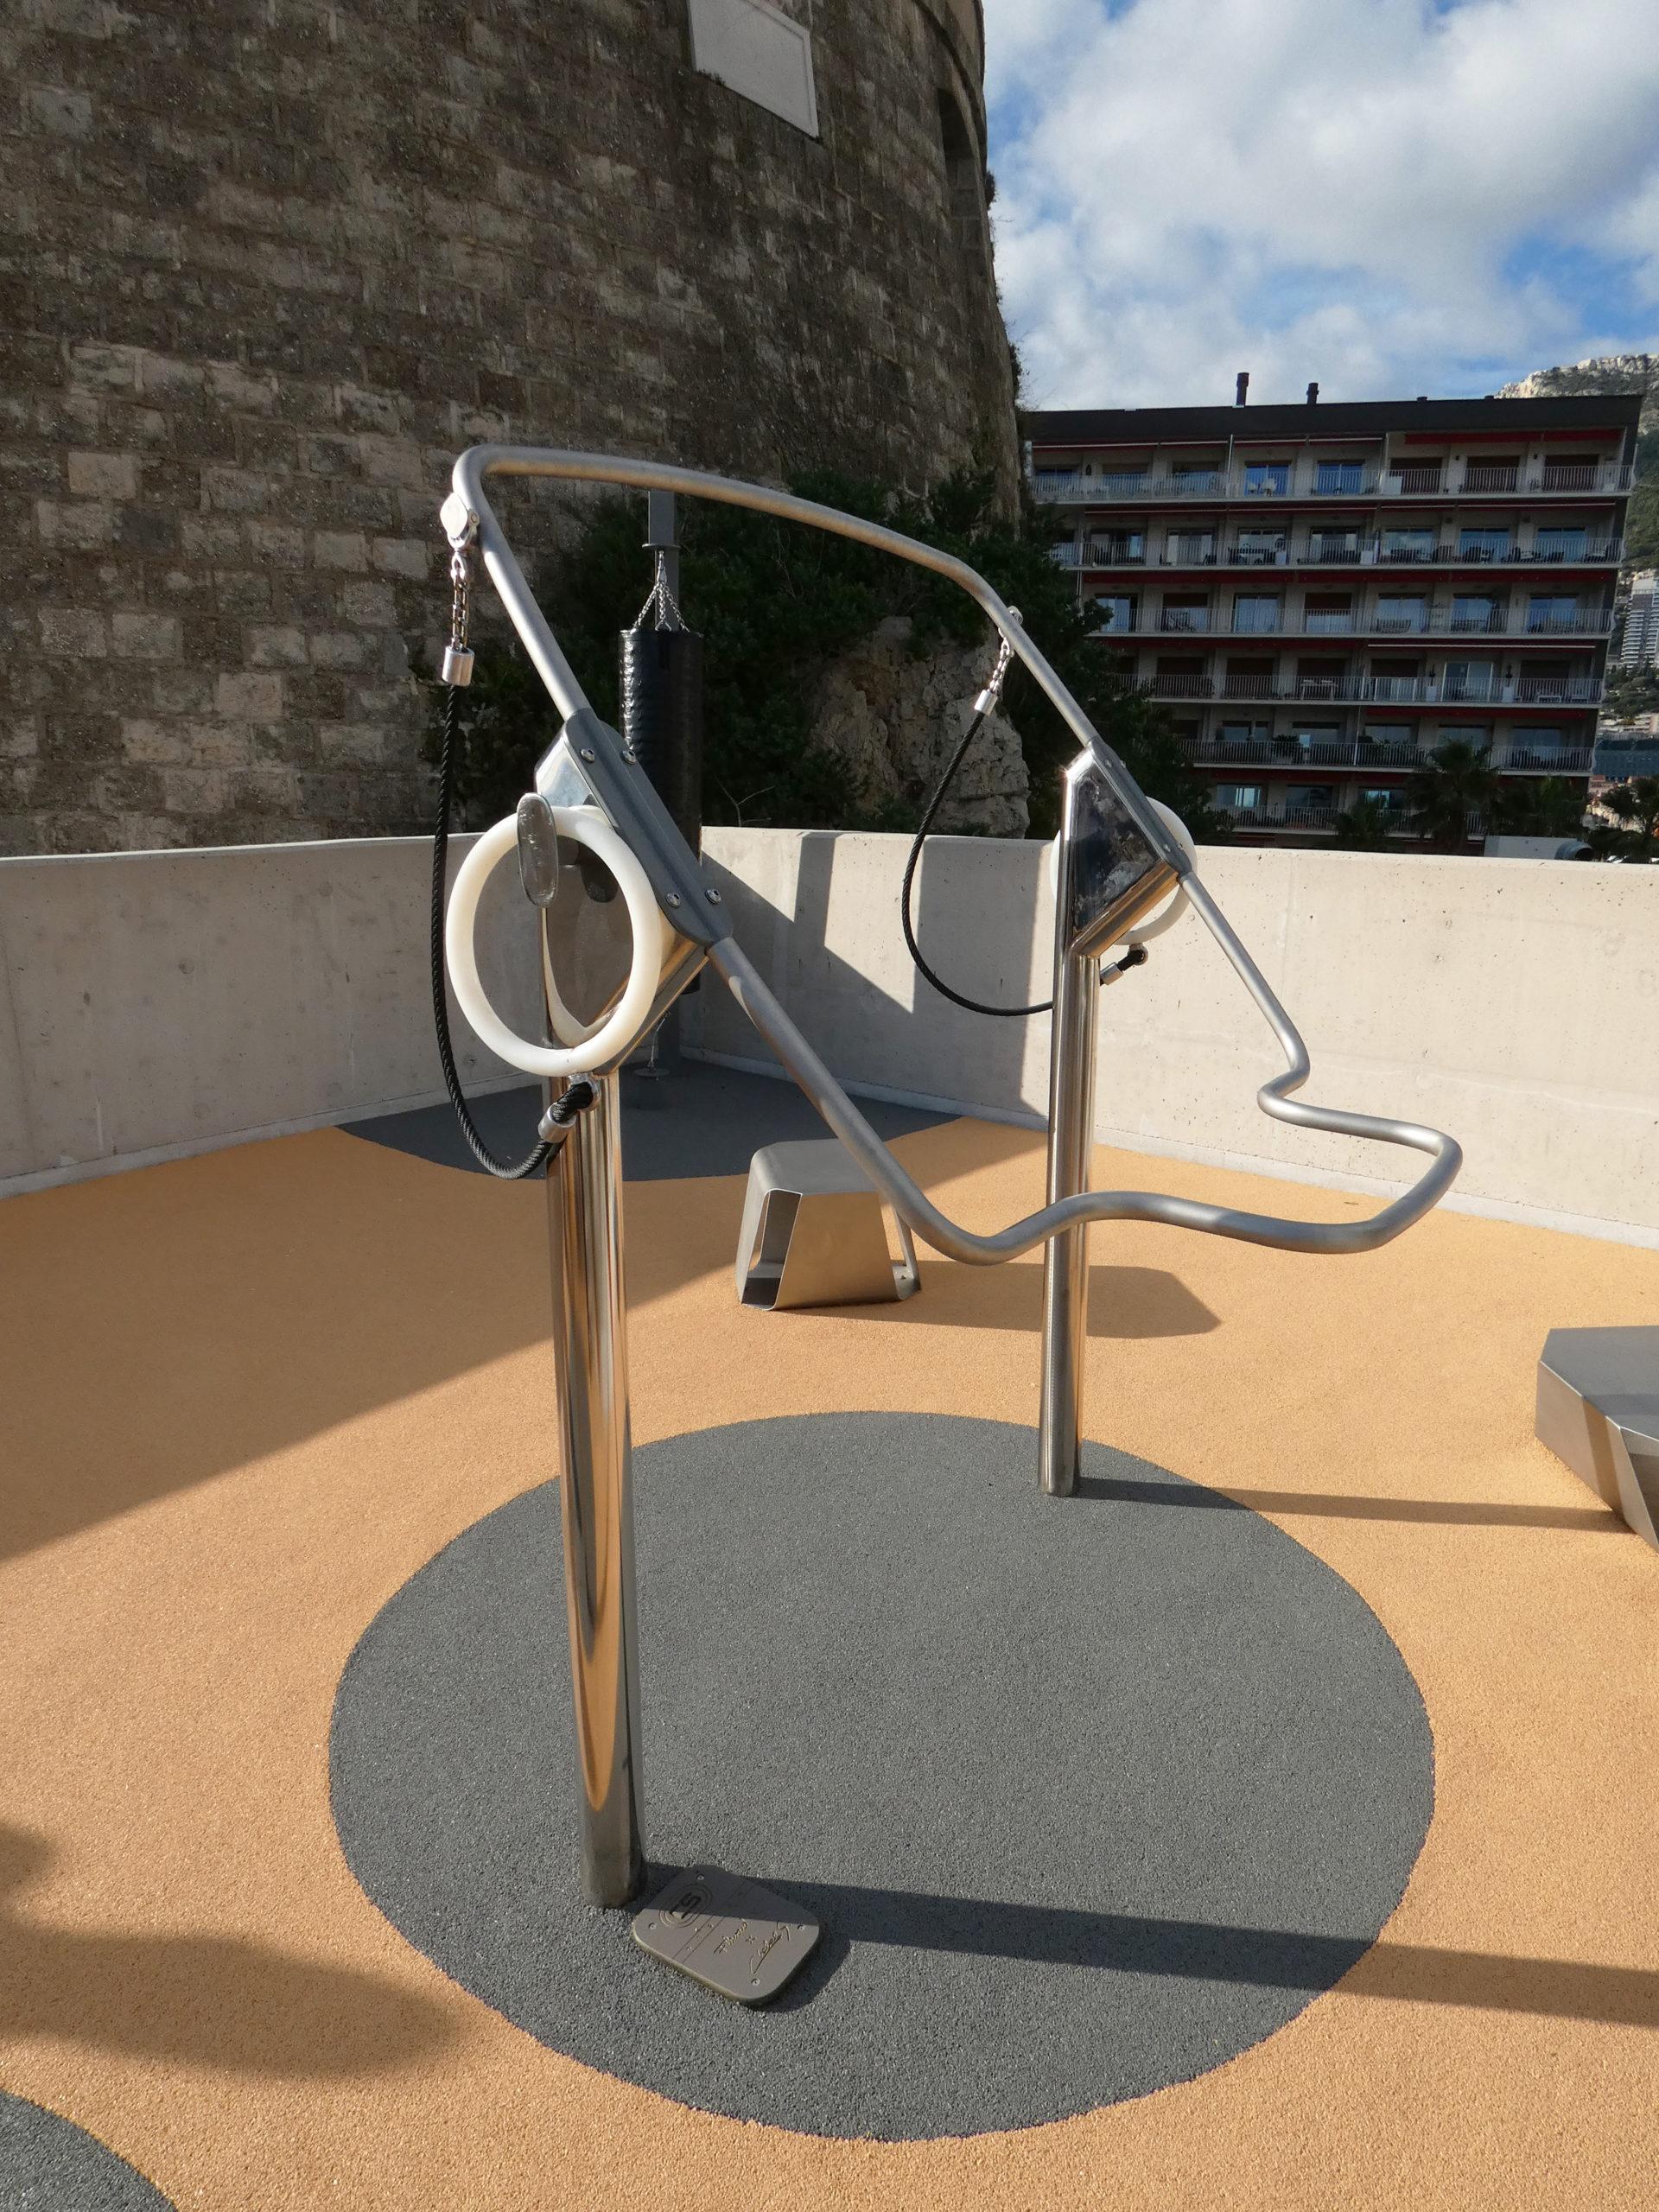 Plateforme de fitness - Port-Hercule